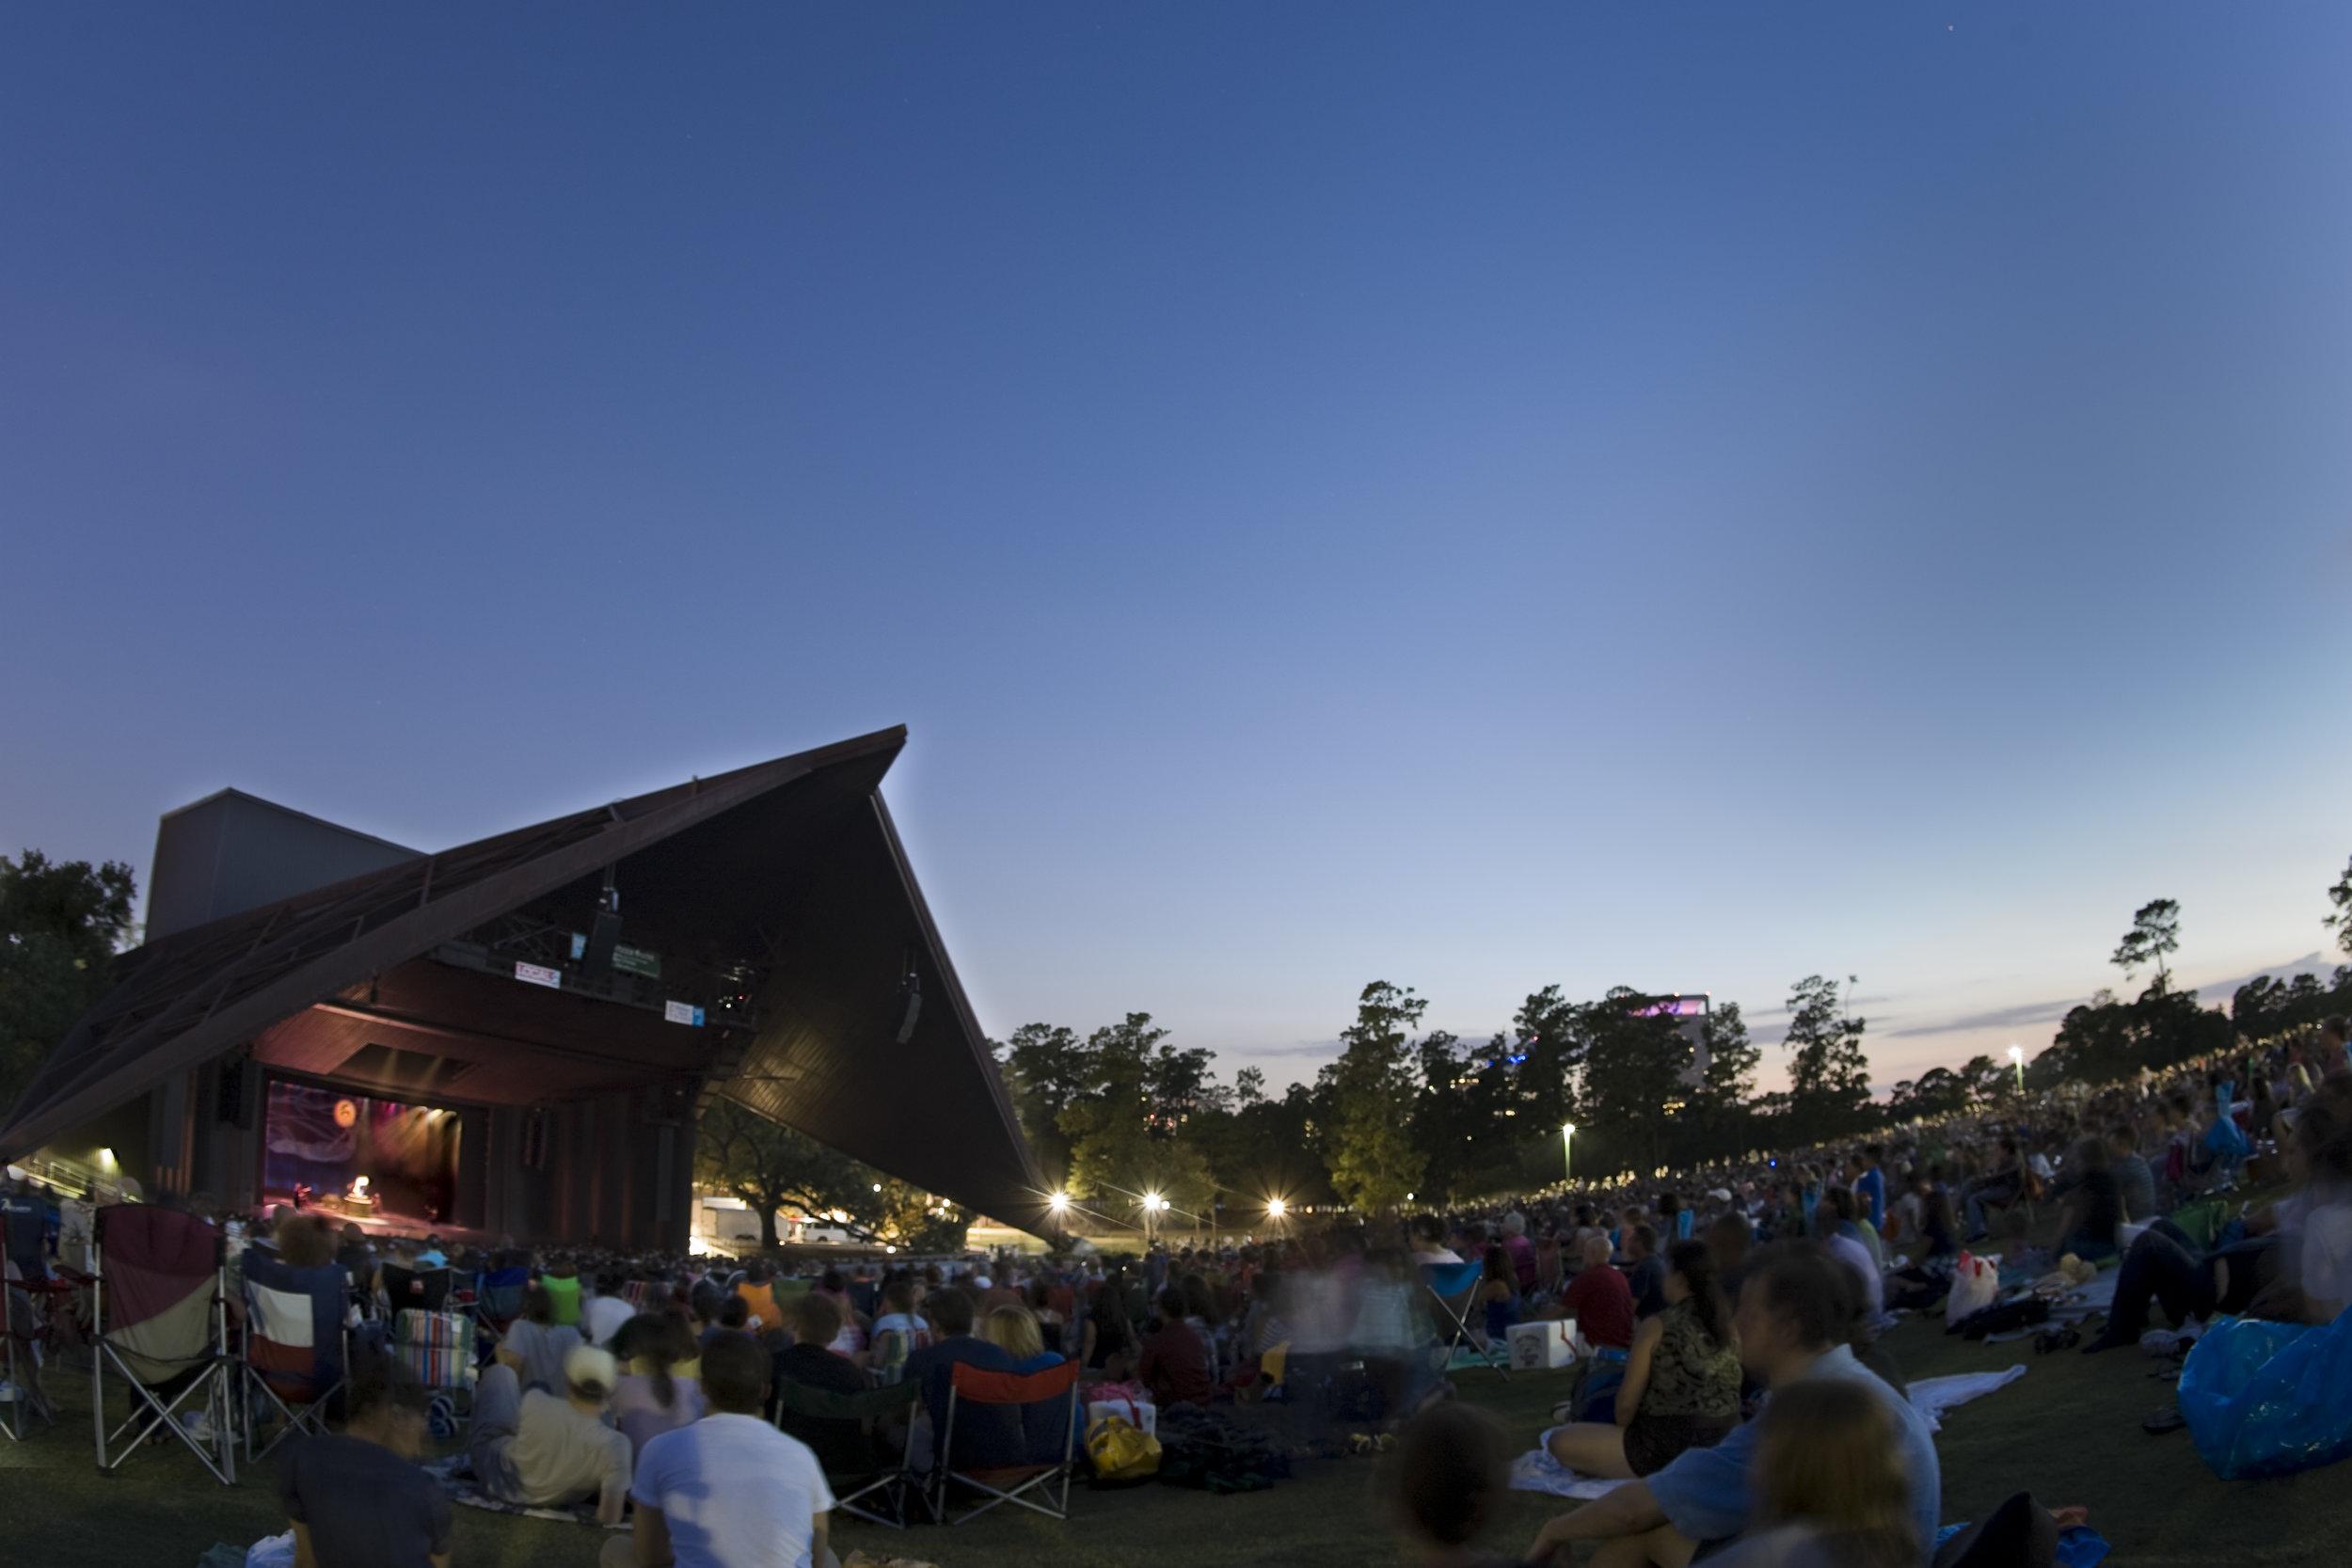 IMG_0333 Miller Outdoor Theatre photo by Anthony Rathbun.JPG